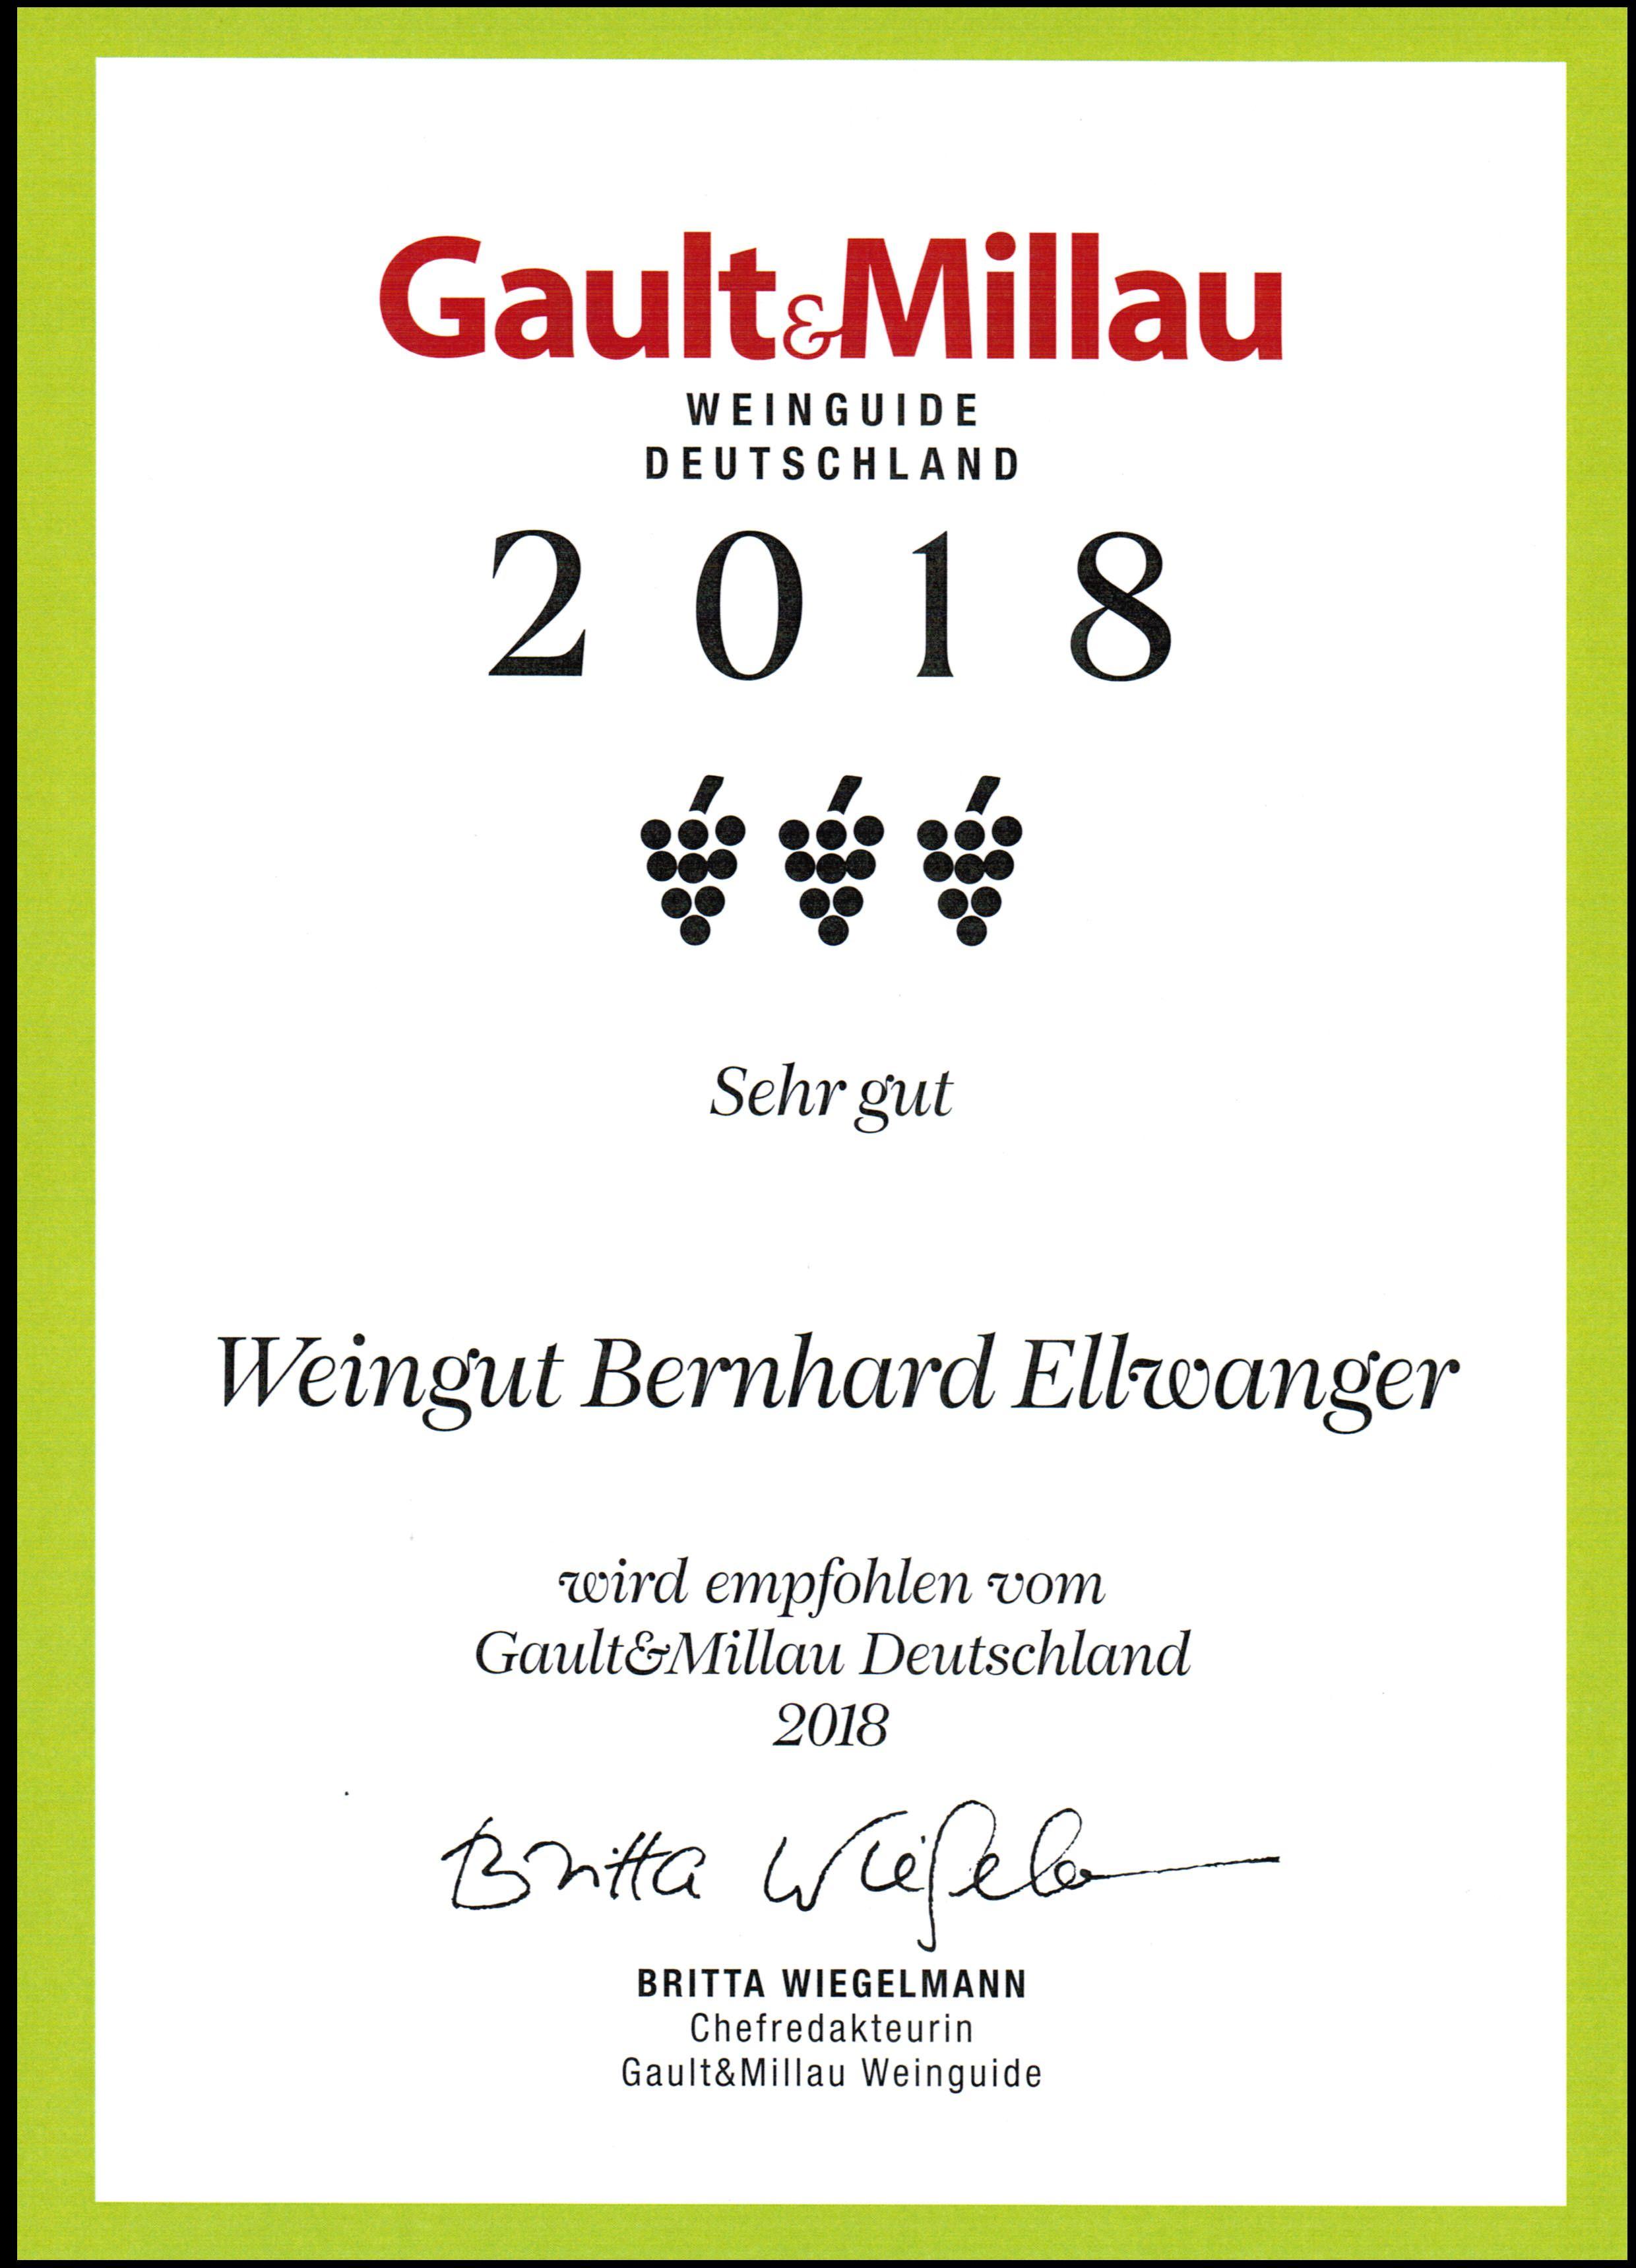 Urkunde Gault Millau 2018